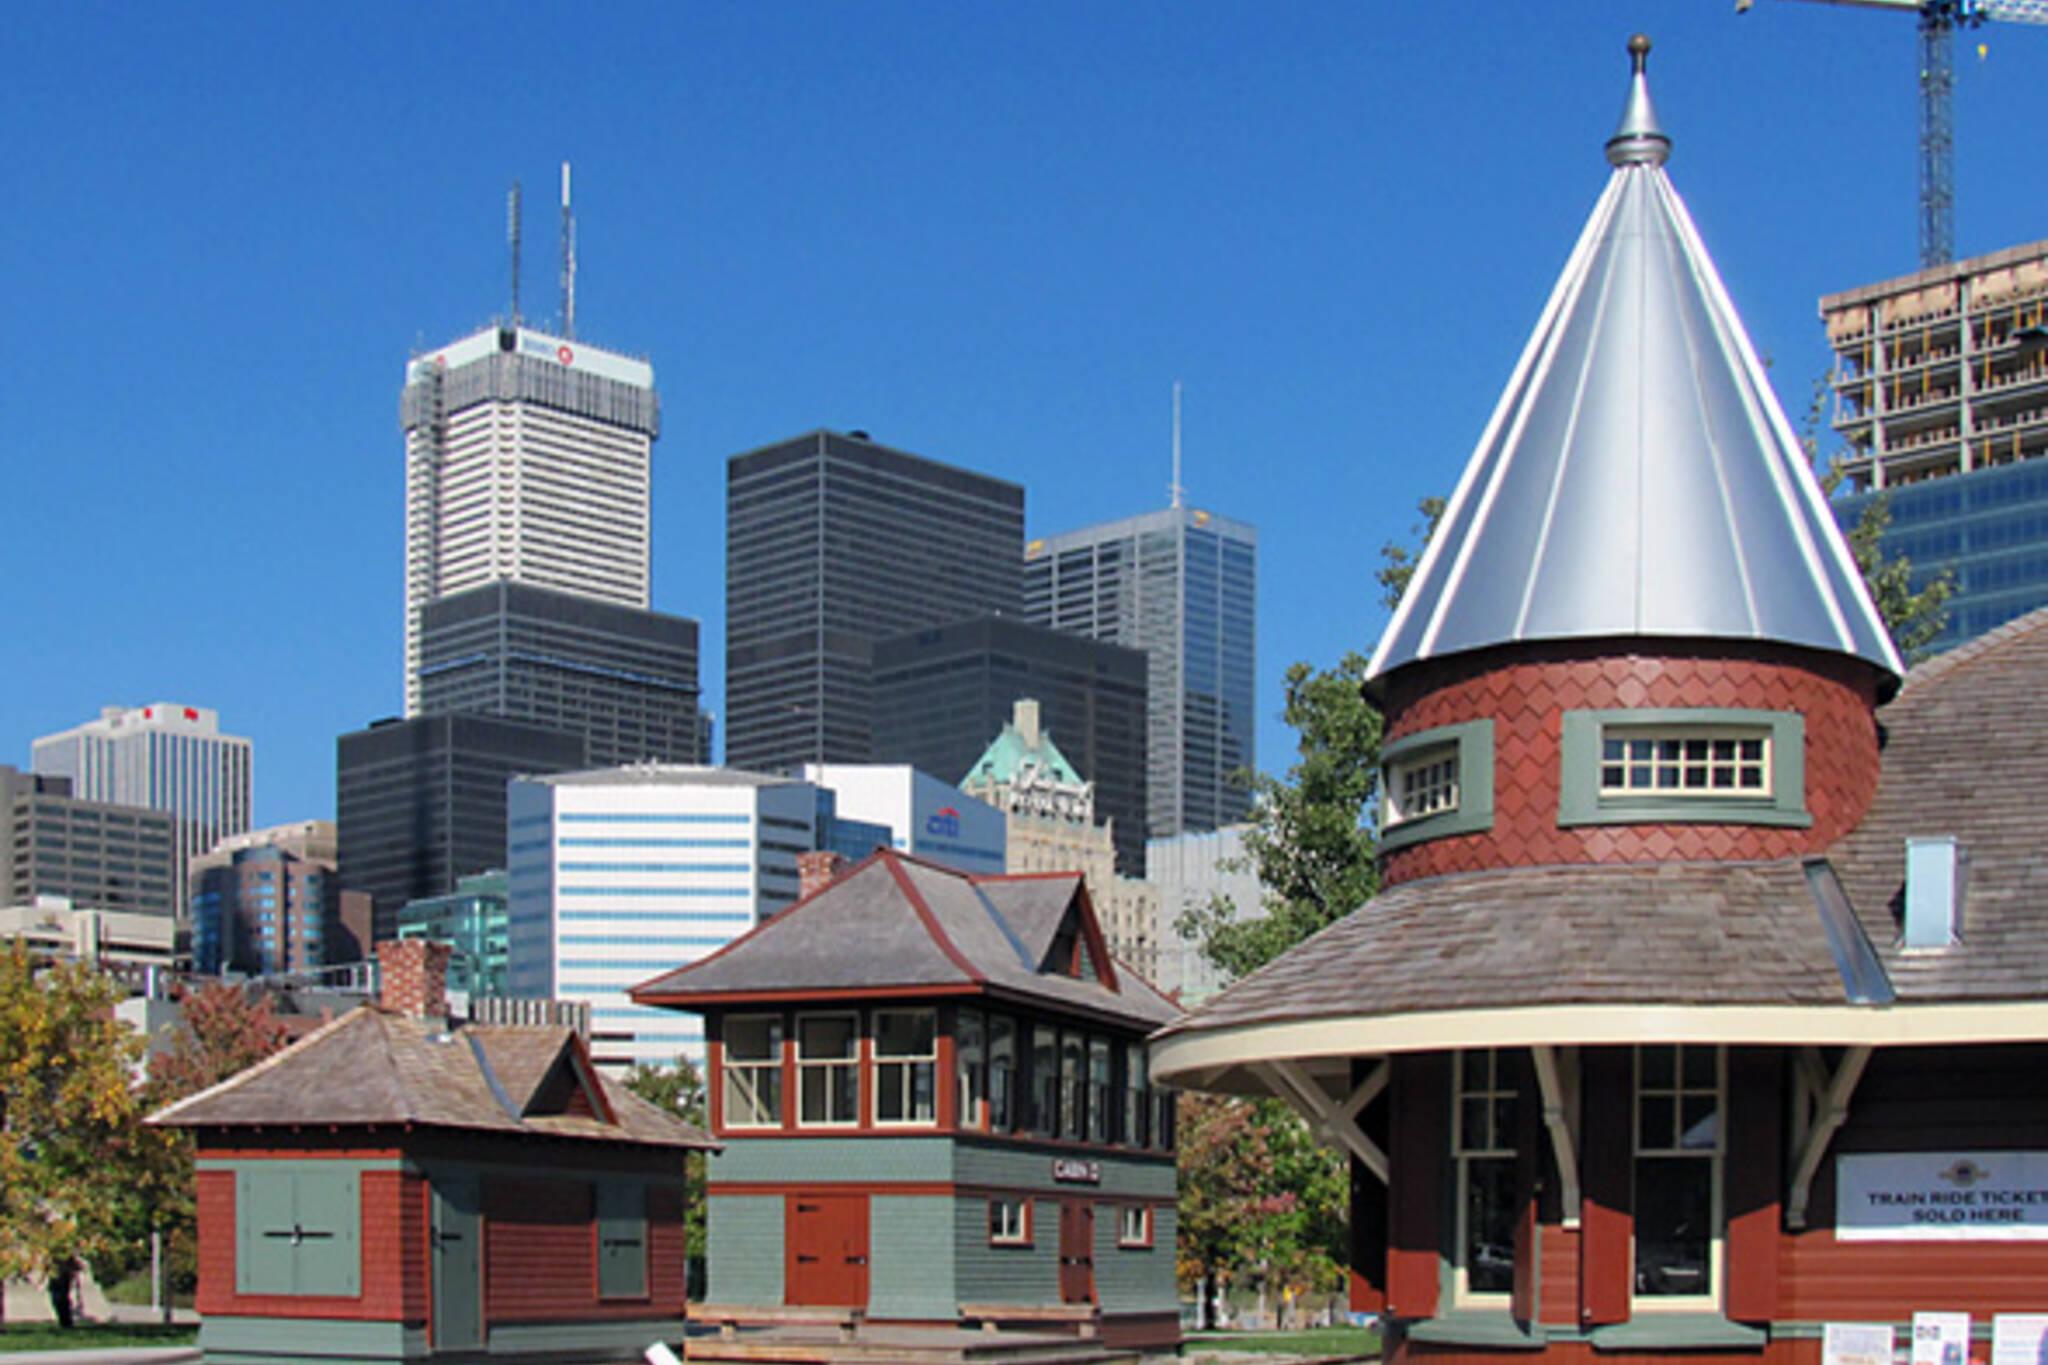 Toronto Roundhouse